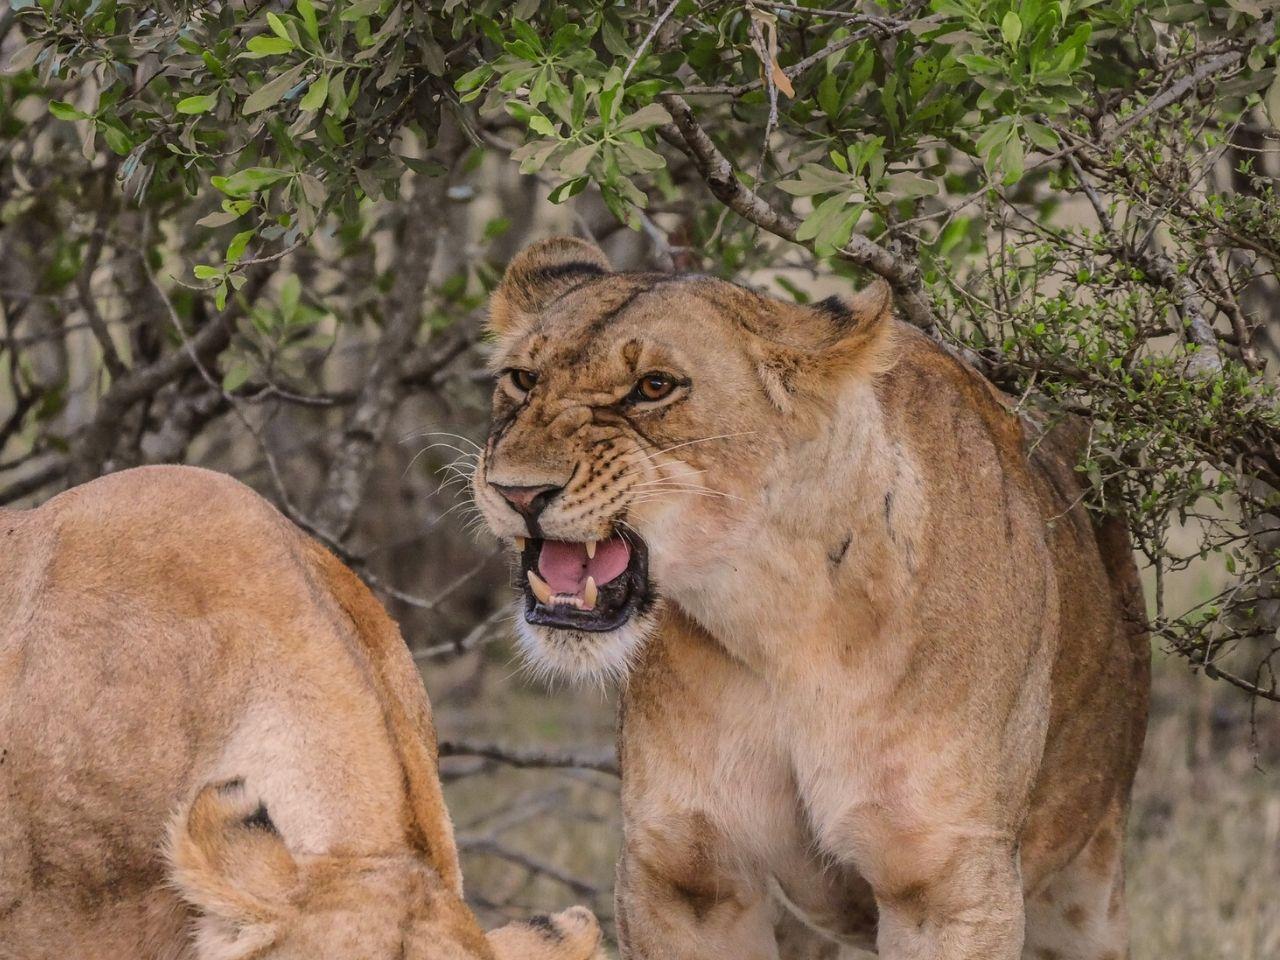 6 Days 5 Nights Magical Kenya Safari Tour. Leadwood Expeditions